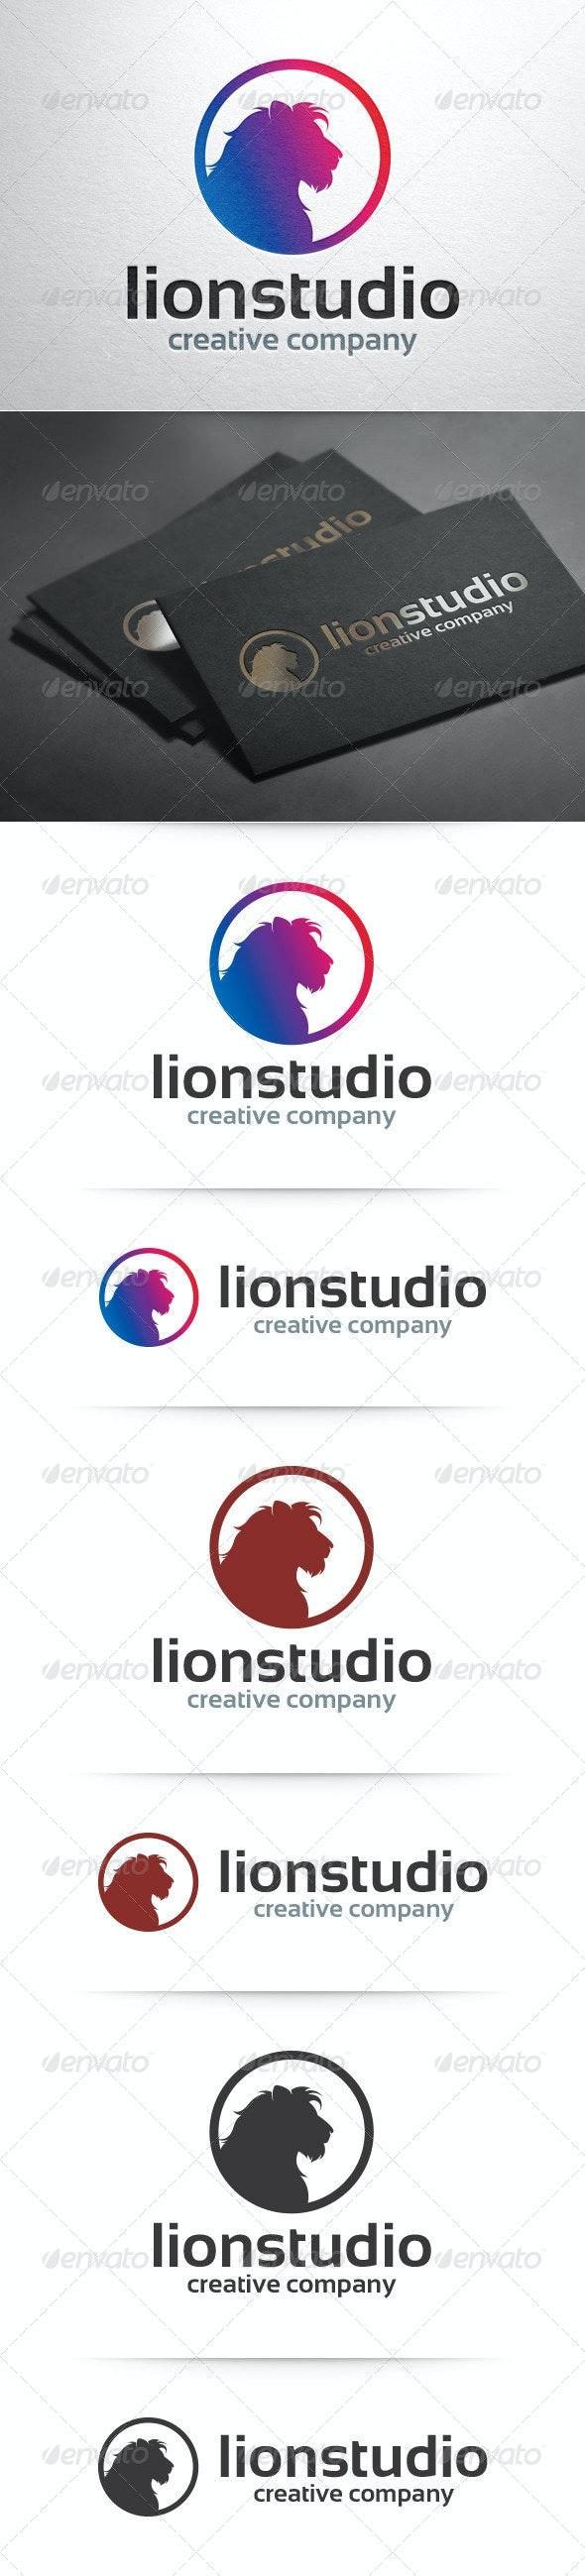 Lion Studio Logo Template - Animals Logo Templates